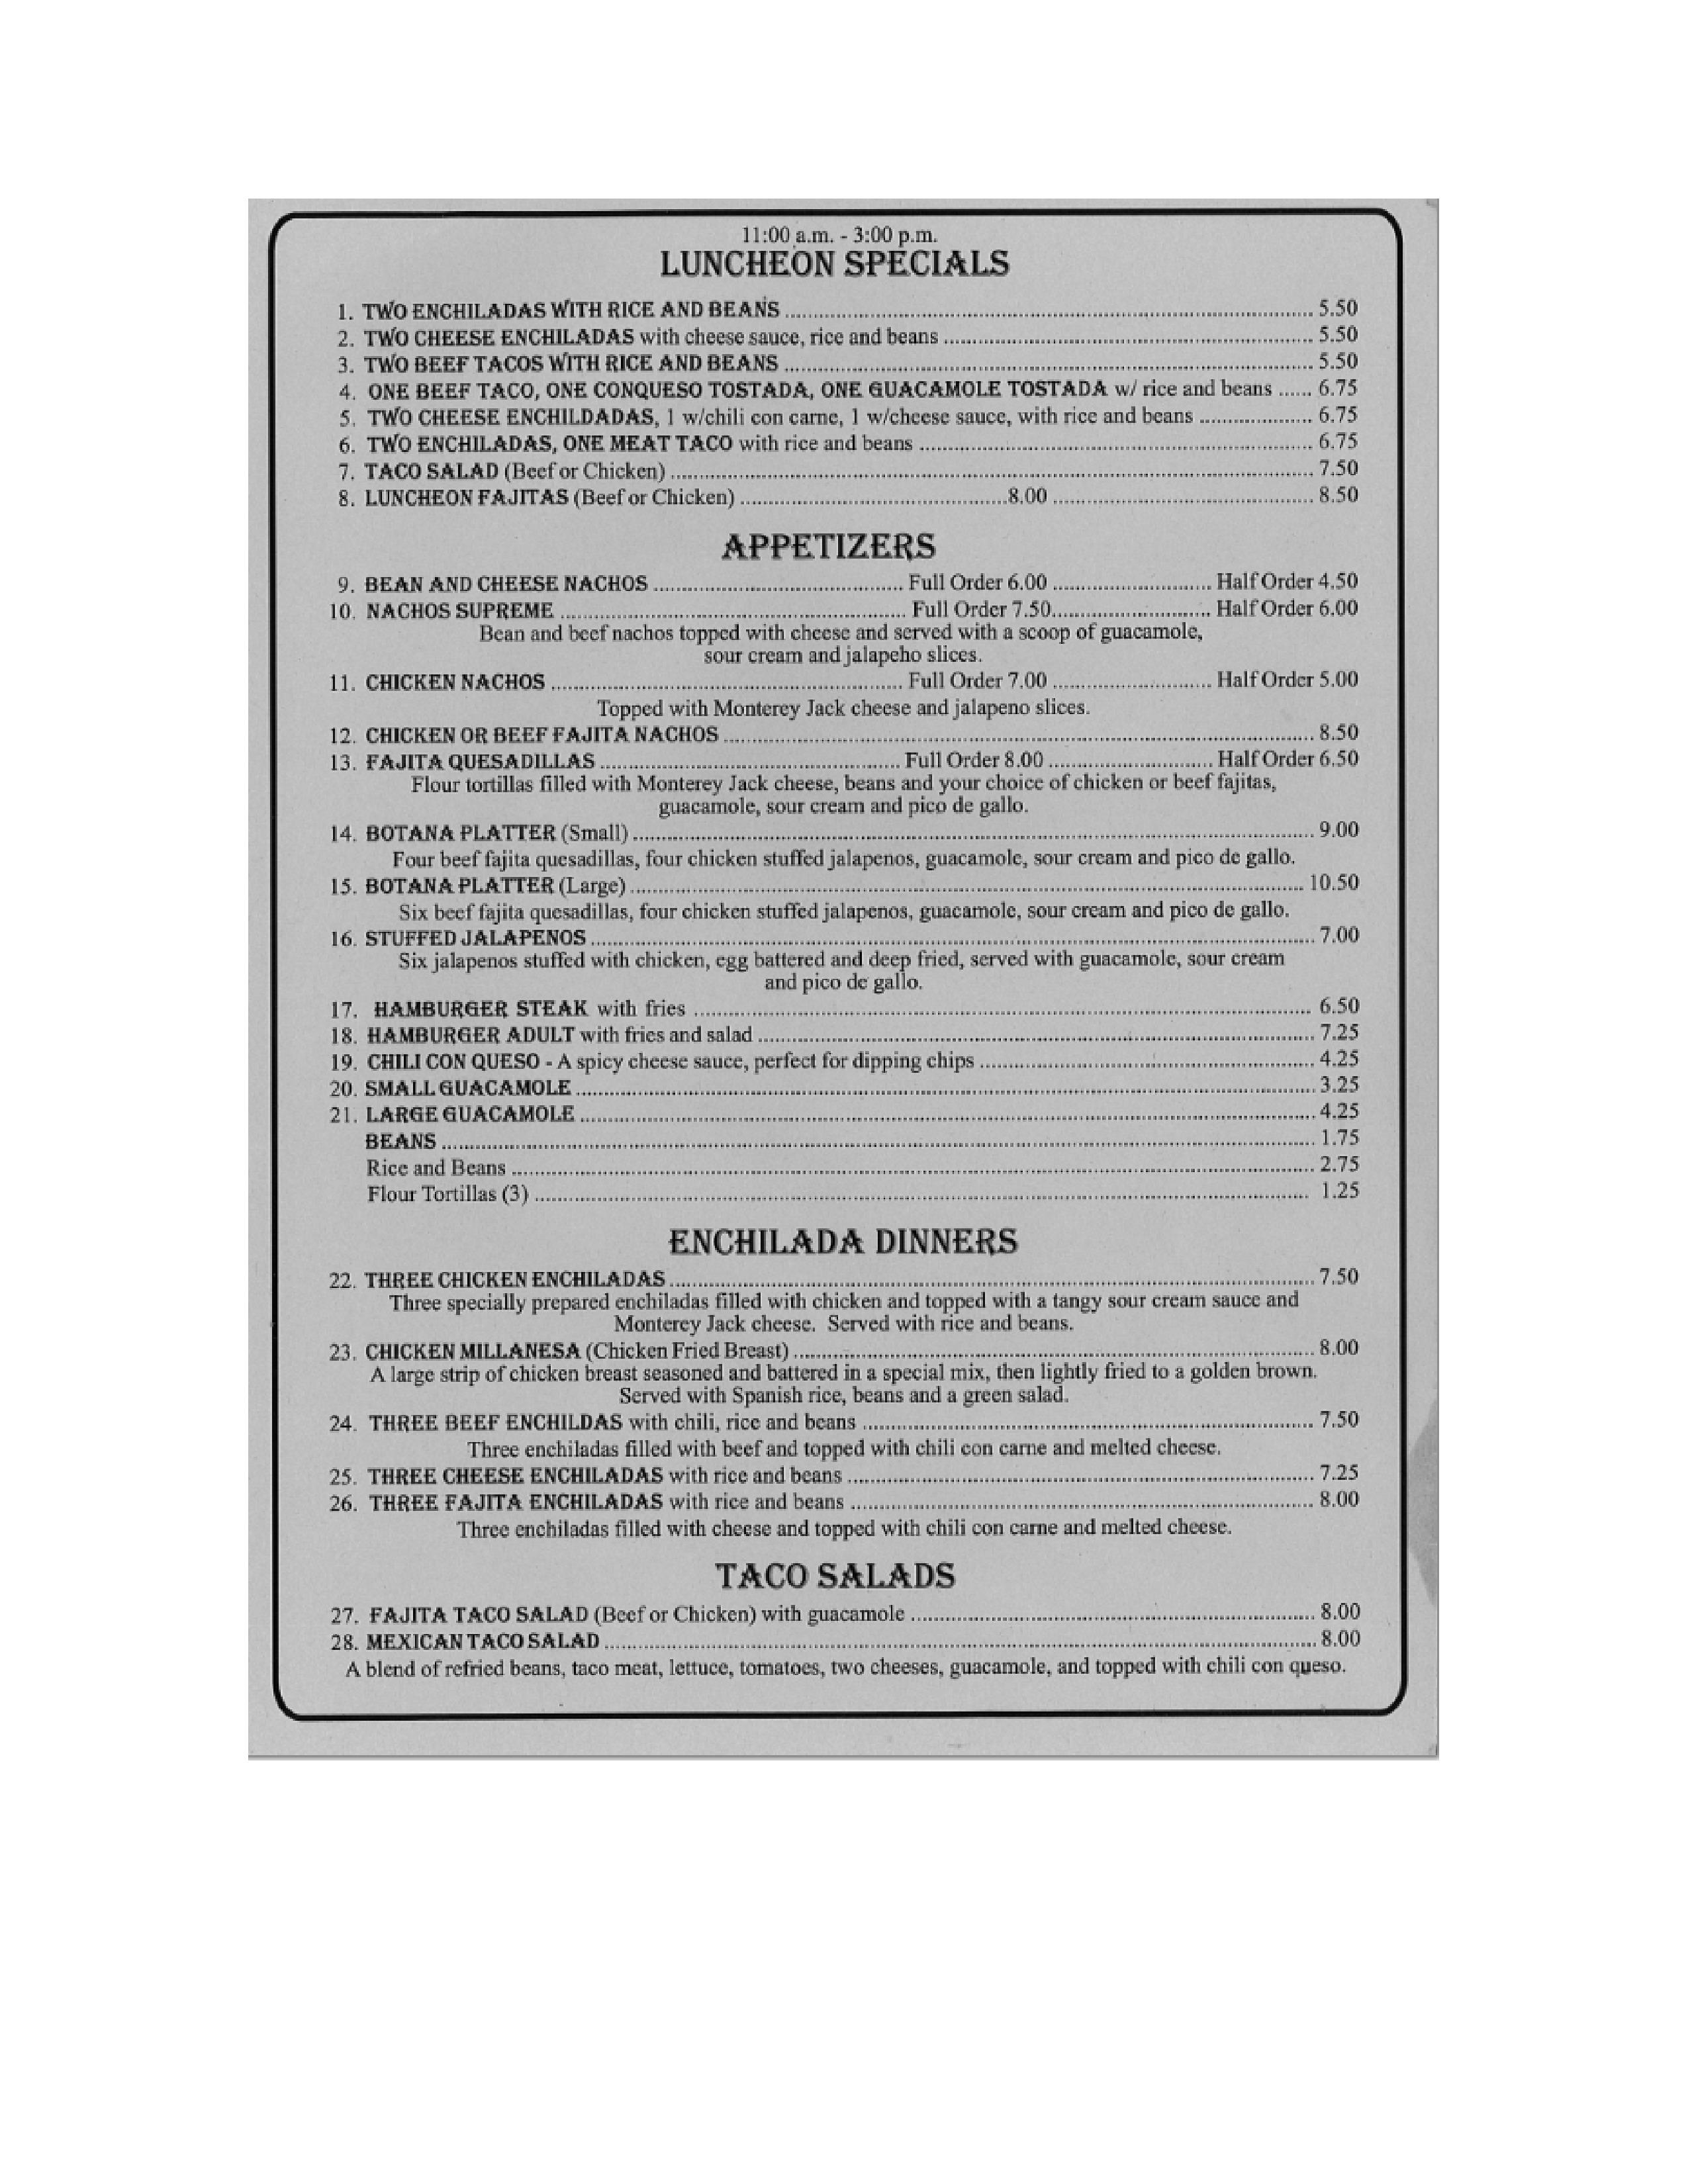 Las Cazvelas Mexican Restaurant, Green Forest AR